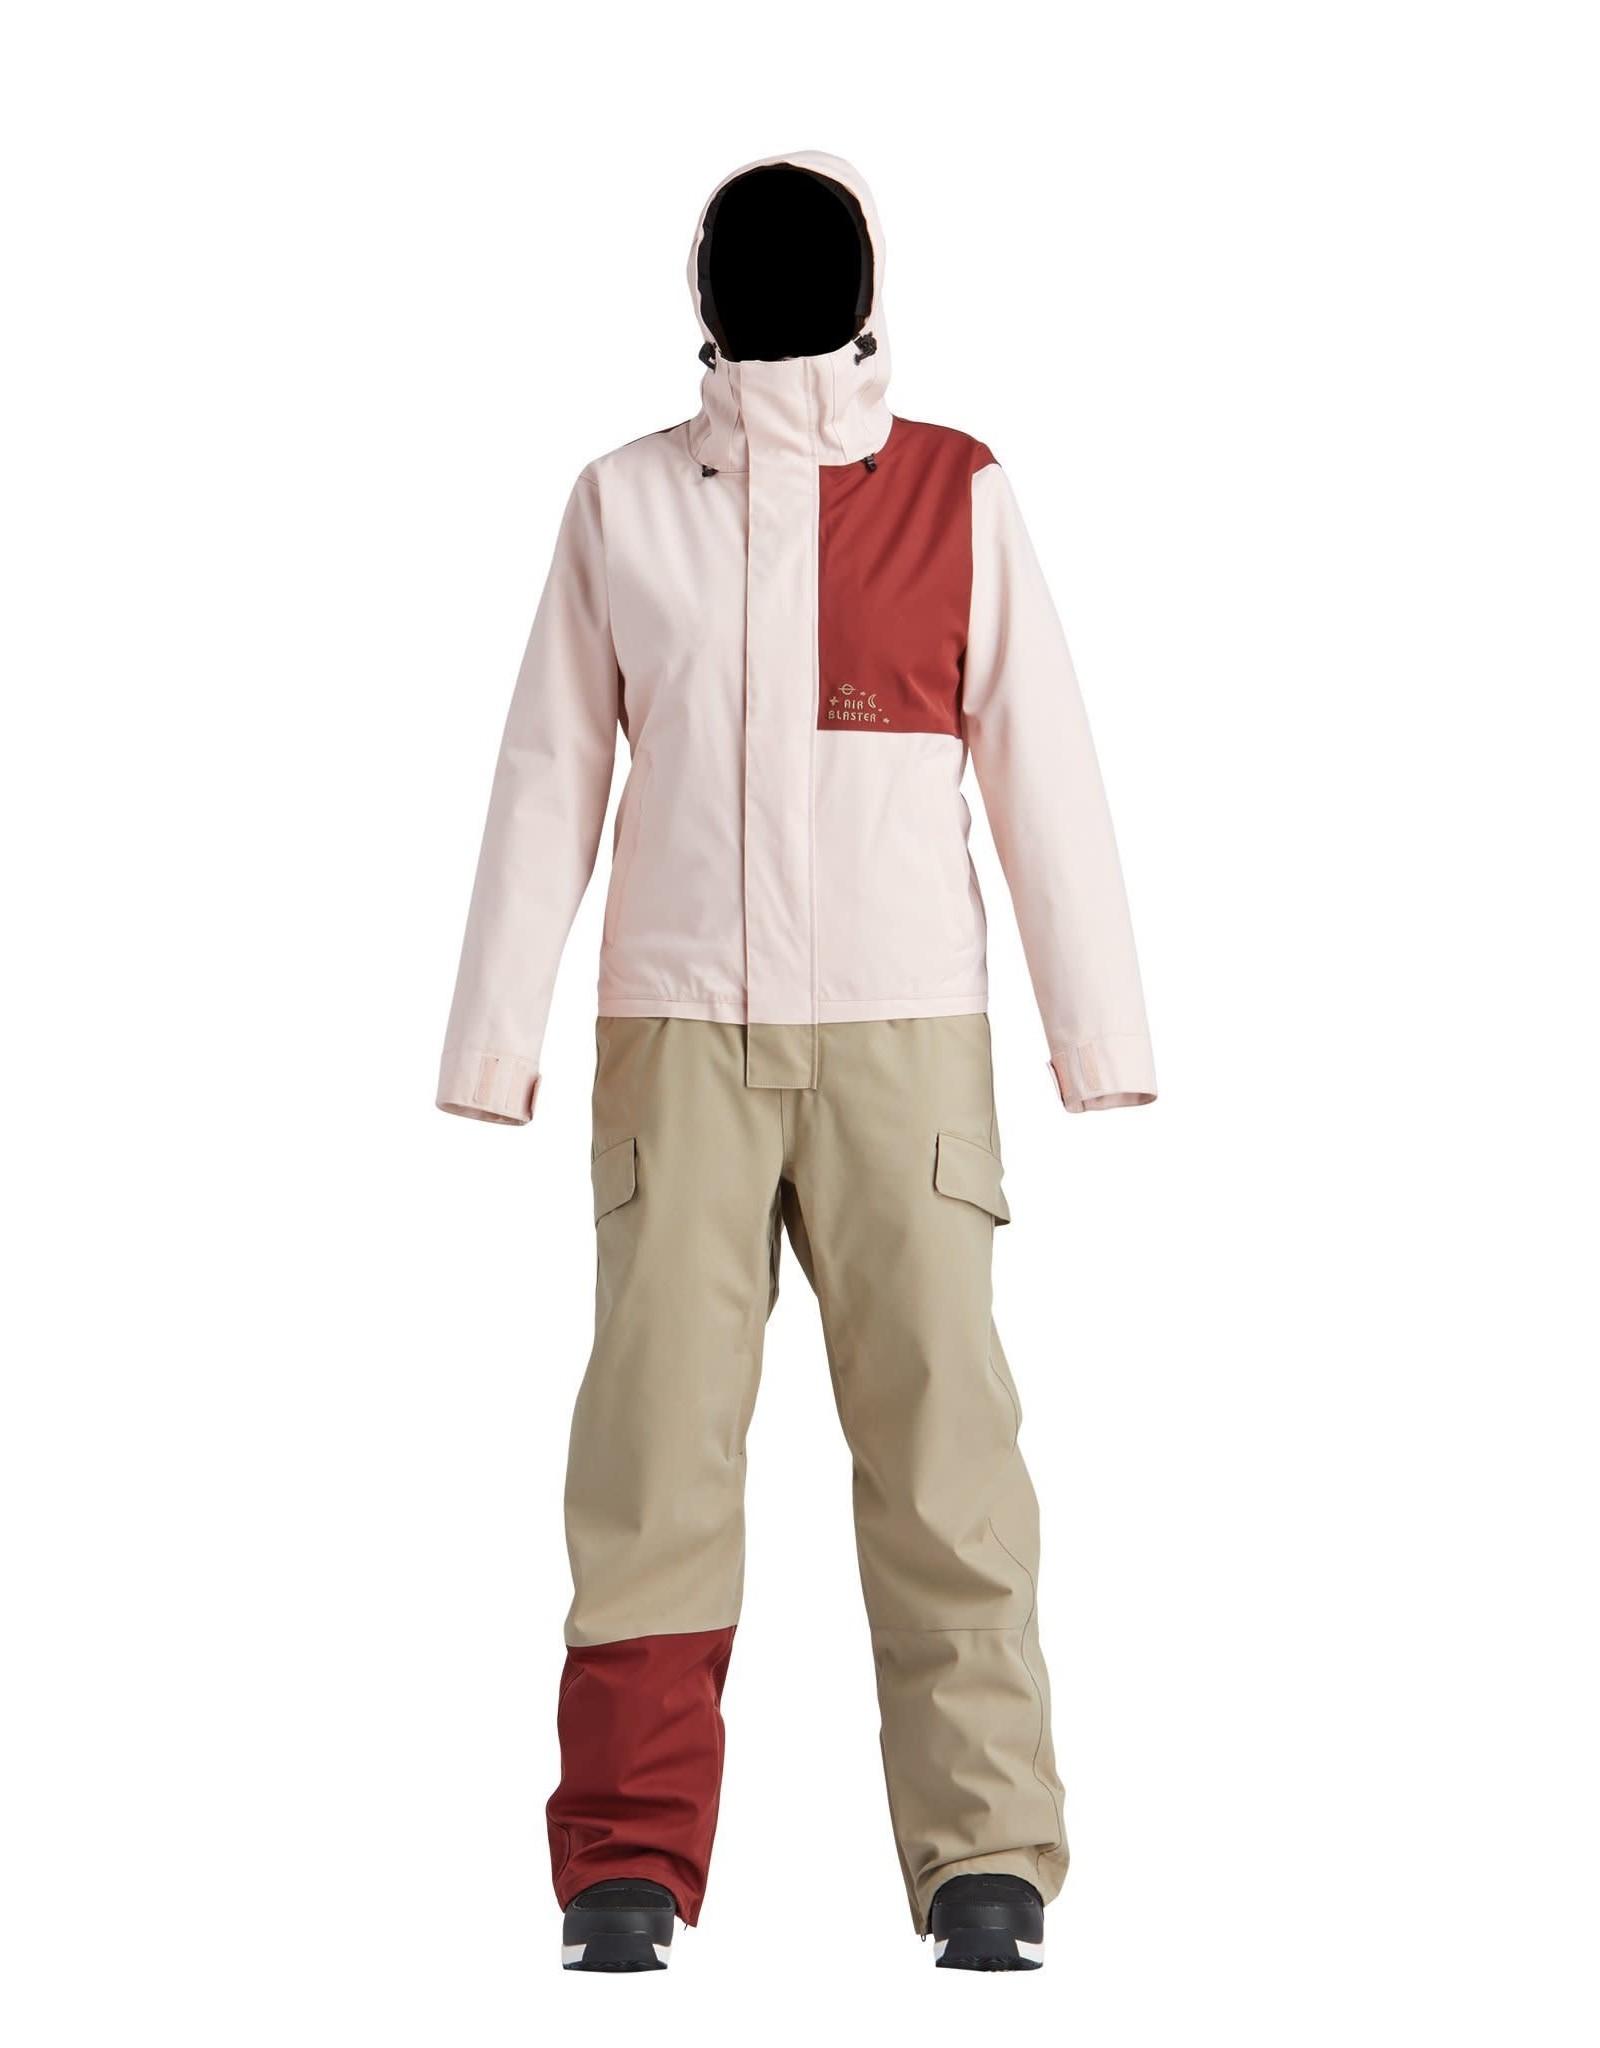 AIRBLASTER Wm's Stretch Freedom Suit